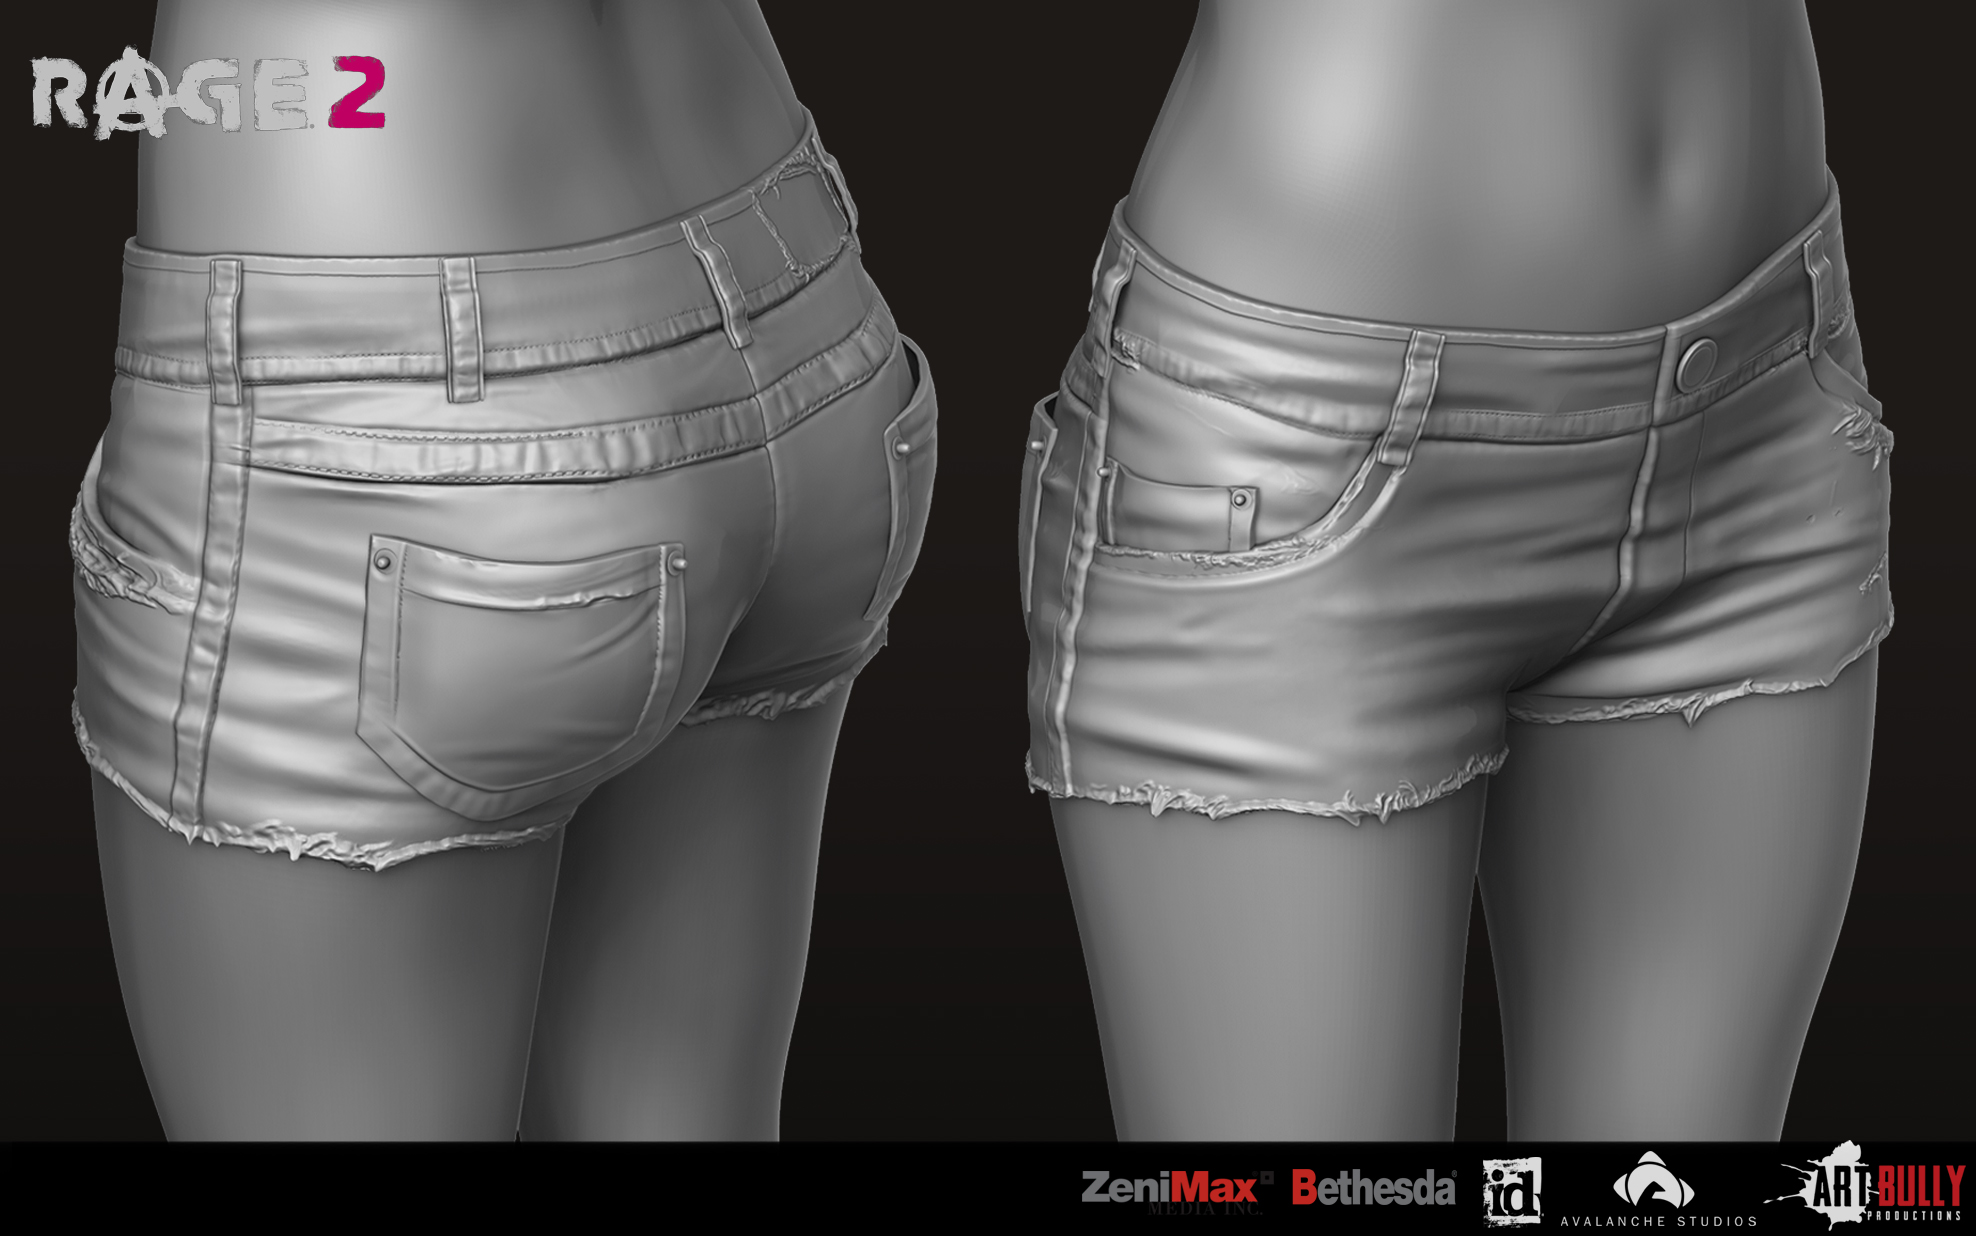 Civilian_Gear_Set_03_Legs_01_Short_Shorts_render.jpg